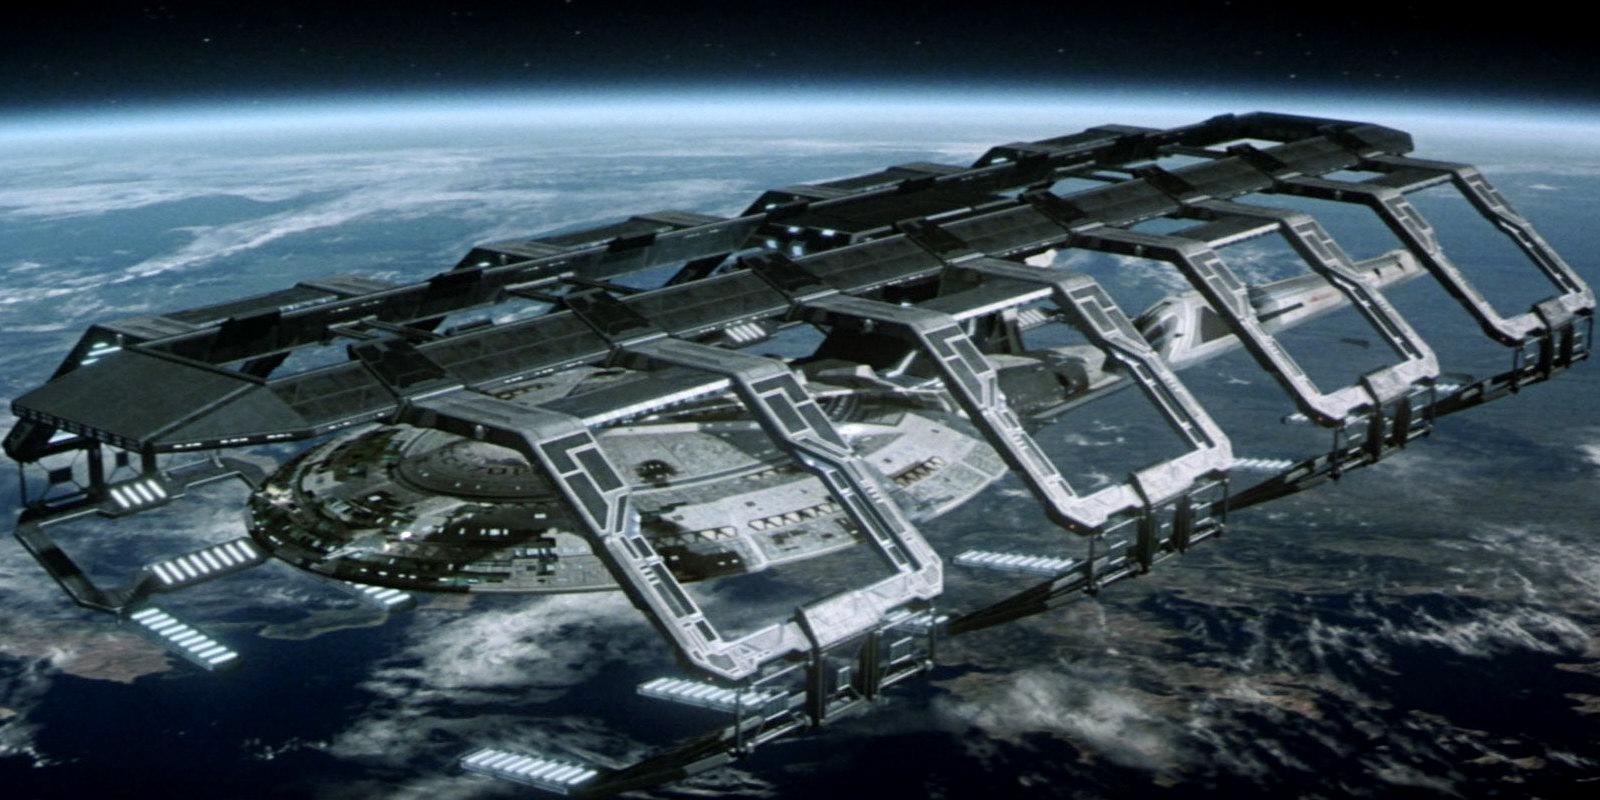 starfleet space stations - photo #45